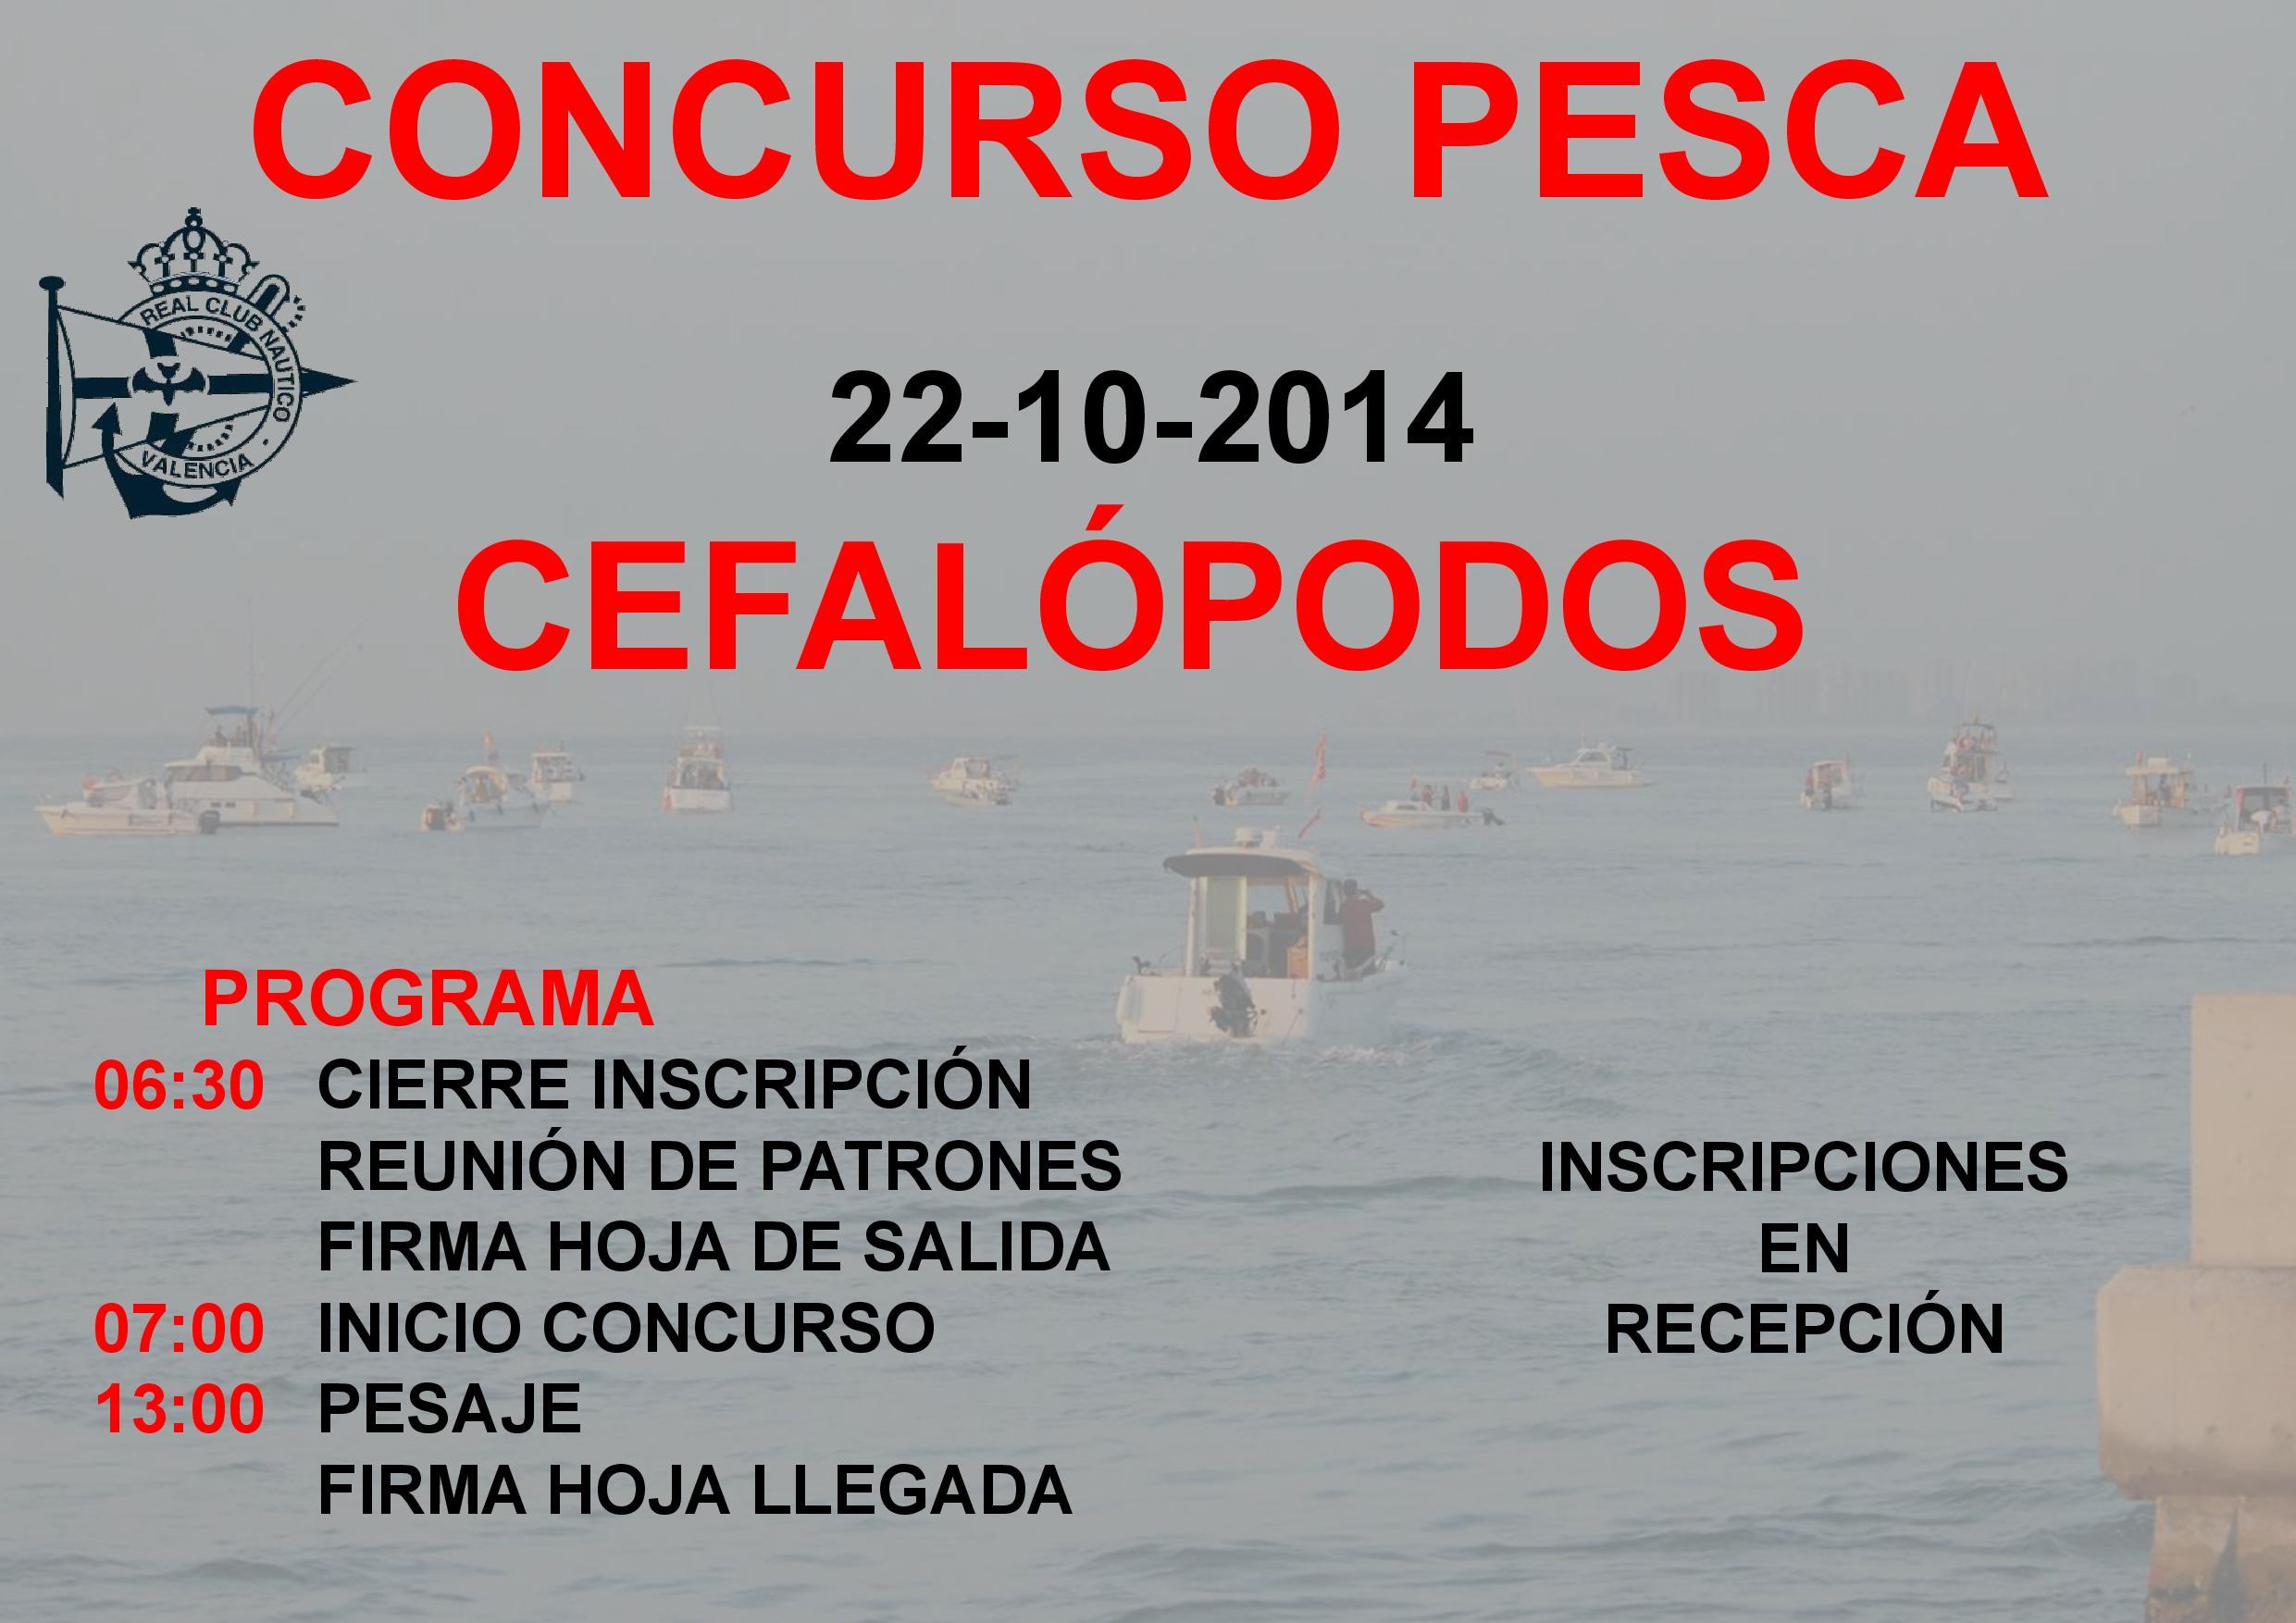 Concurso Pesca Cefalopodos